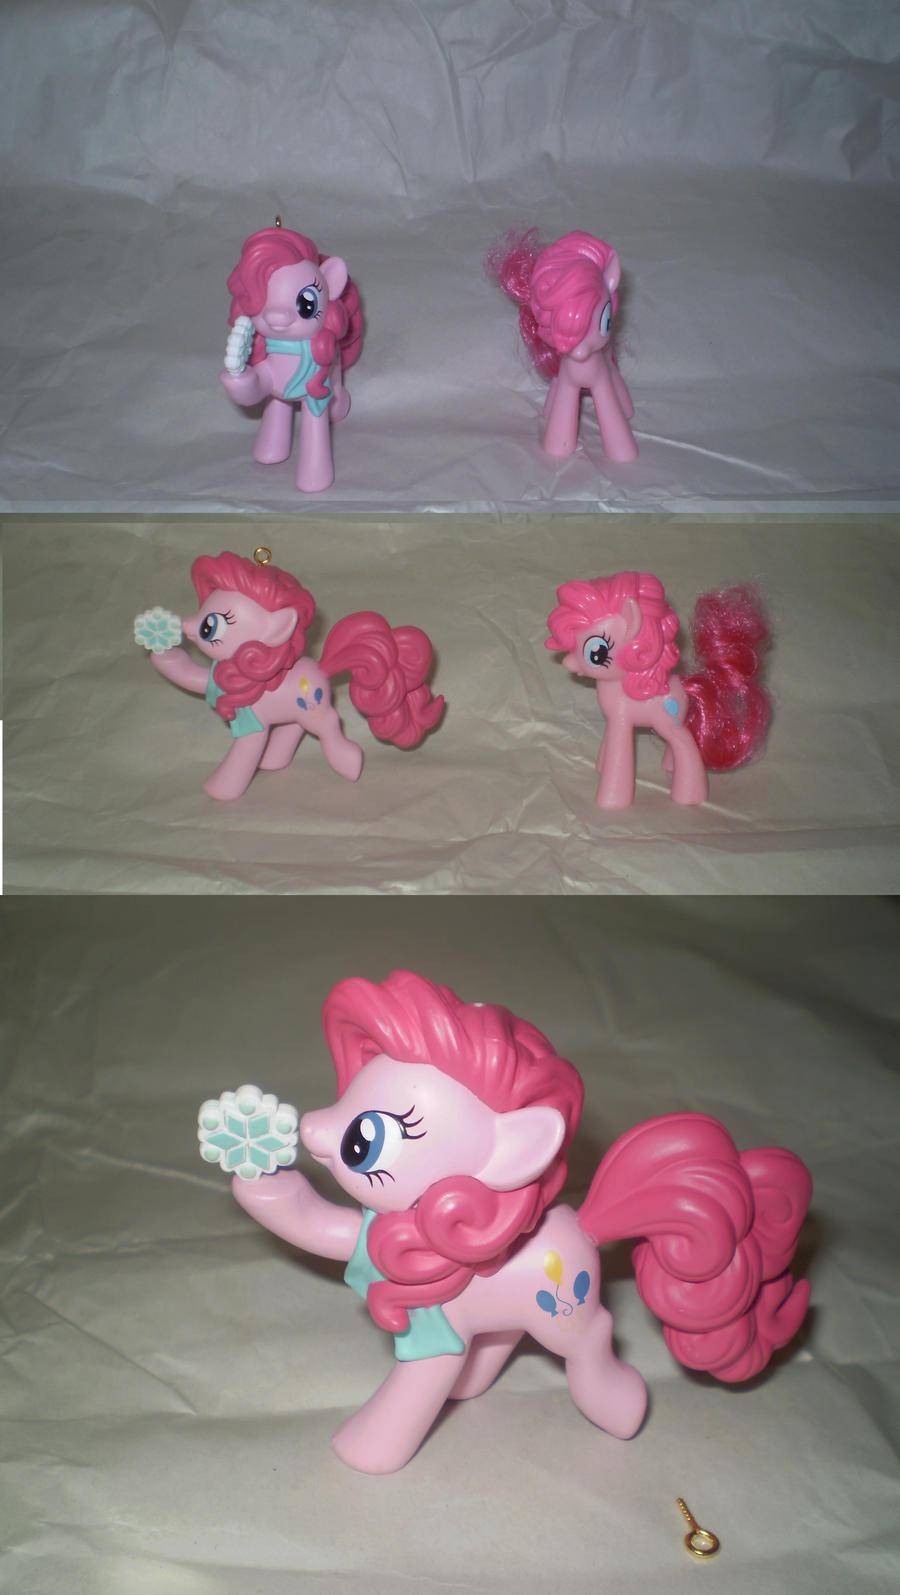 pinkie ornament vs pinkie toy by StarSongPony